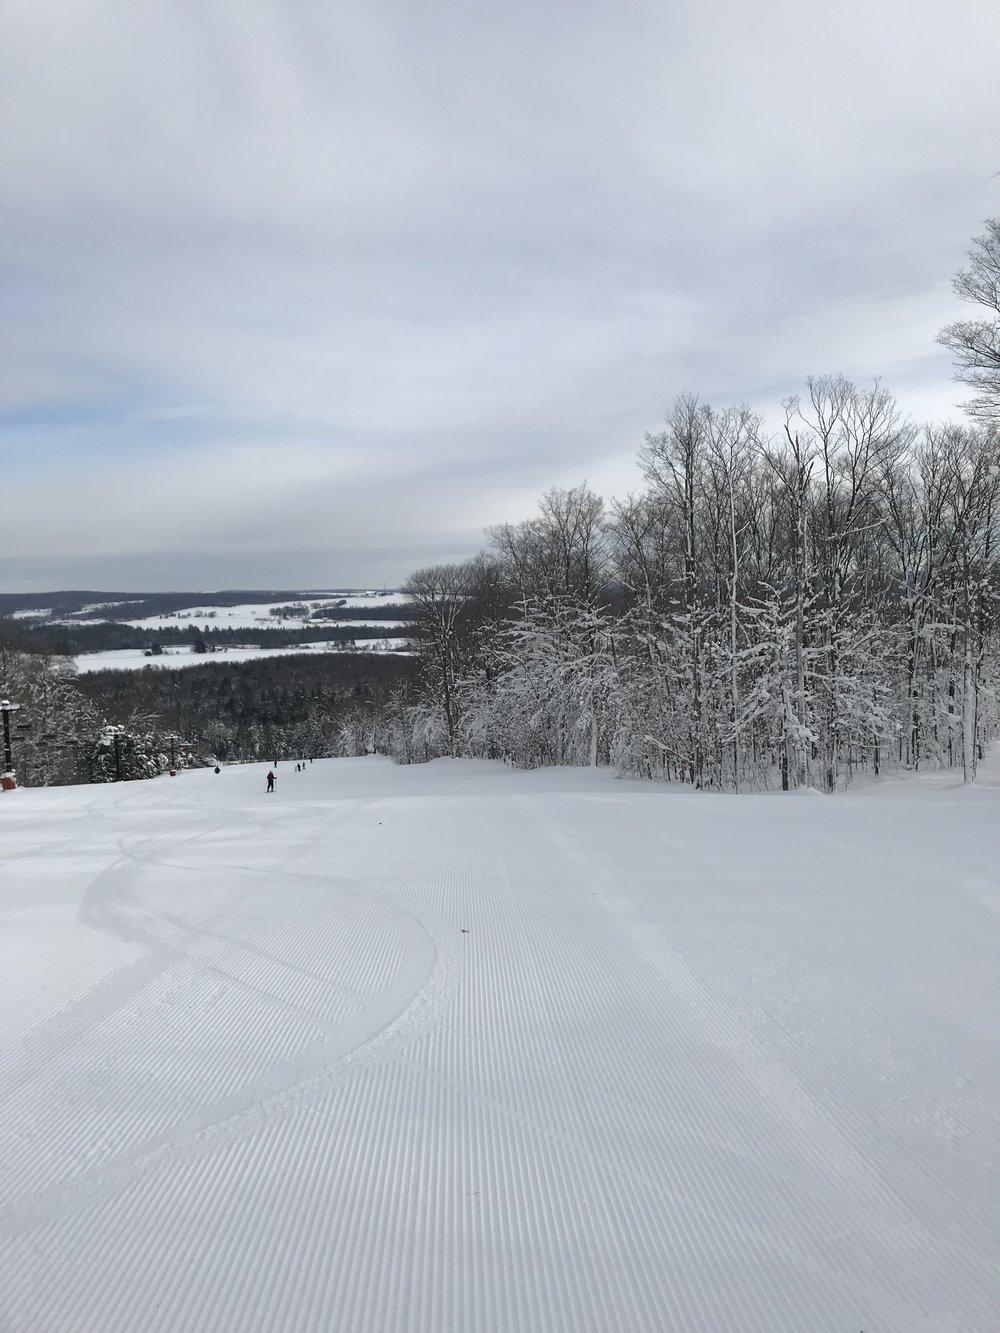 Ski_Peek n' Peak Resort_Credit_JenniferMerrick.JPG